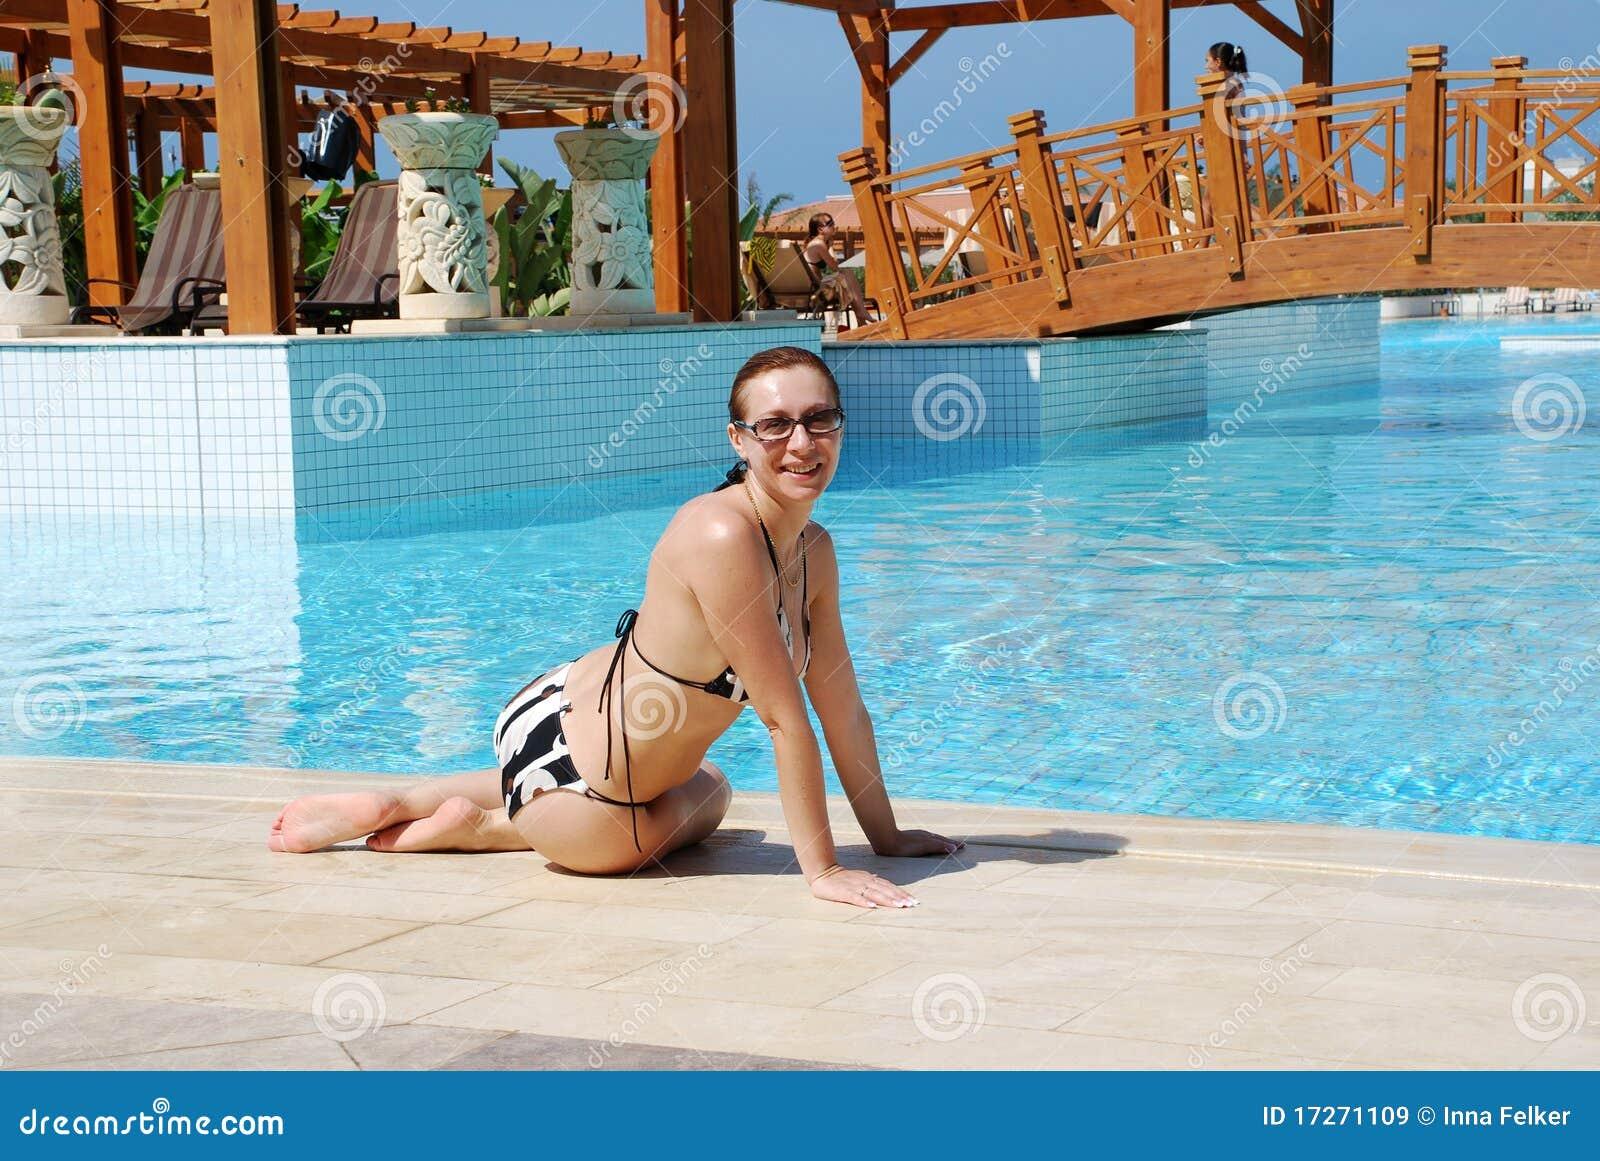 Smiling woman sitting near swimming pool